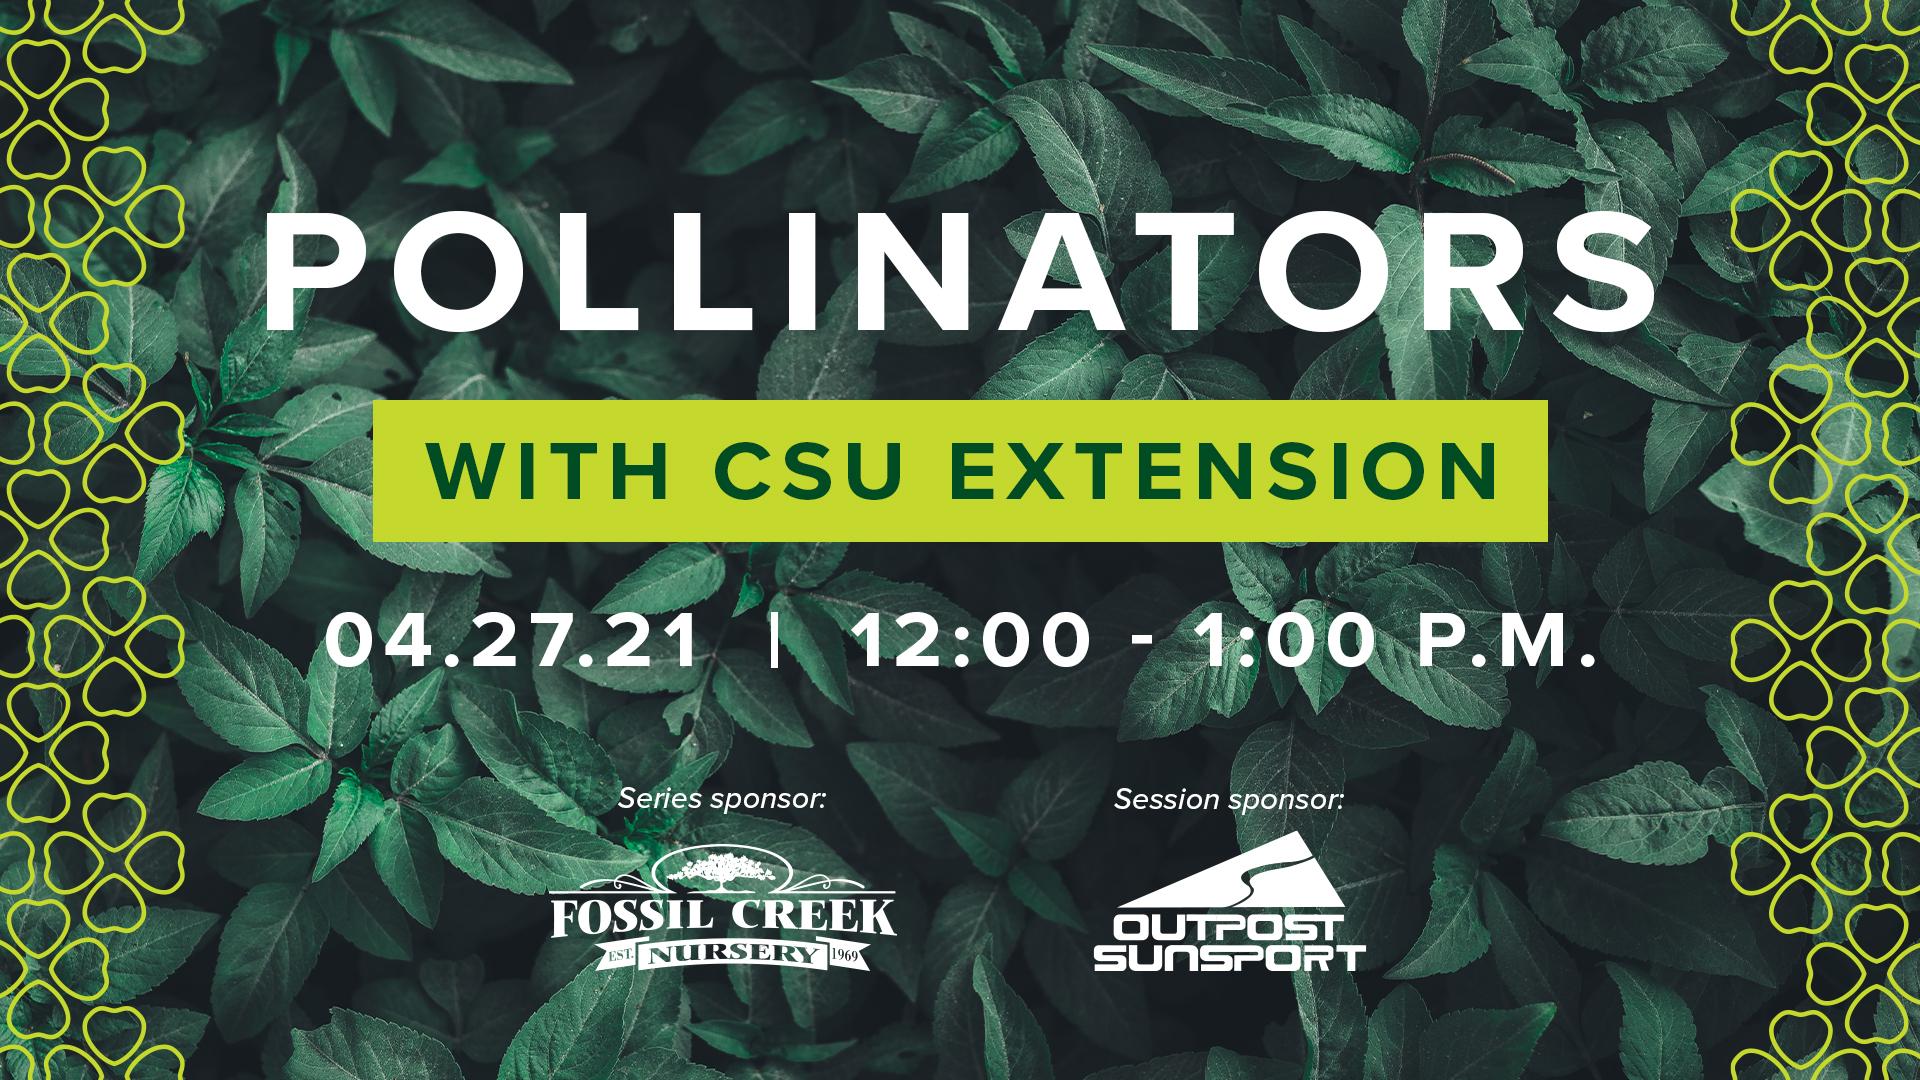 Image for Gardening Series with CSU Extension: Pollinators webinar